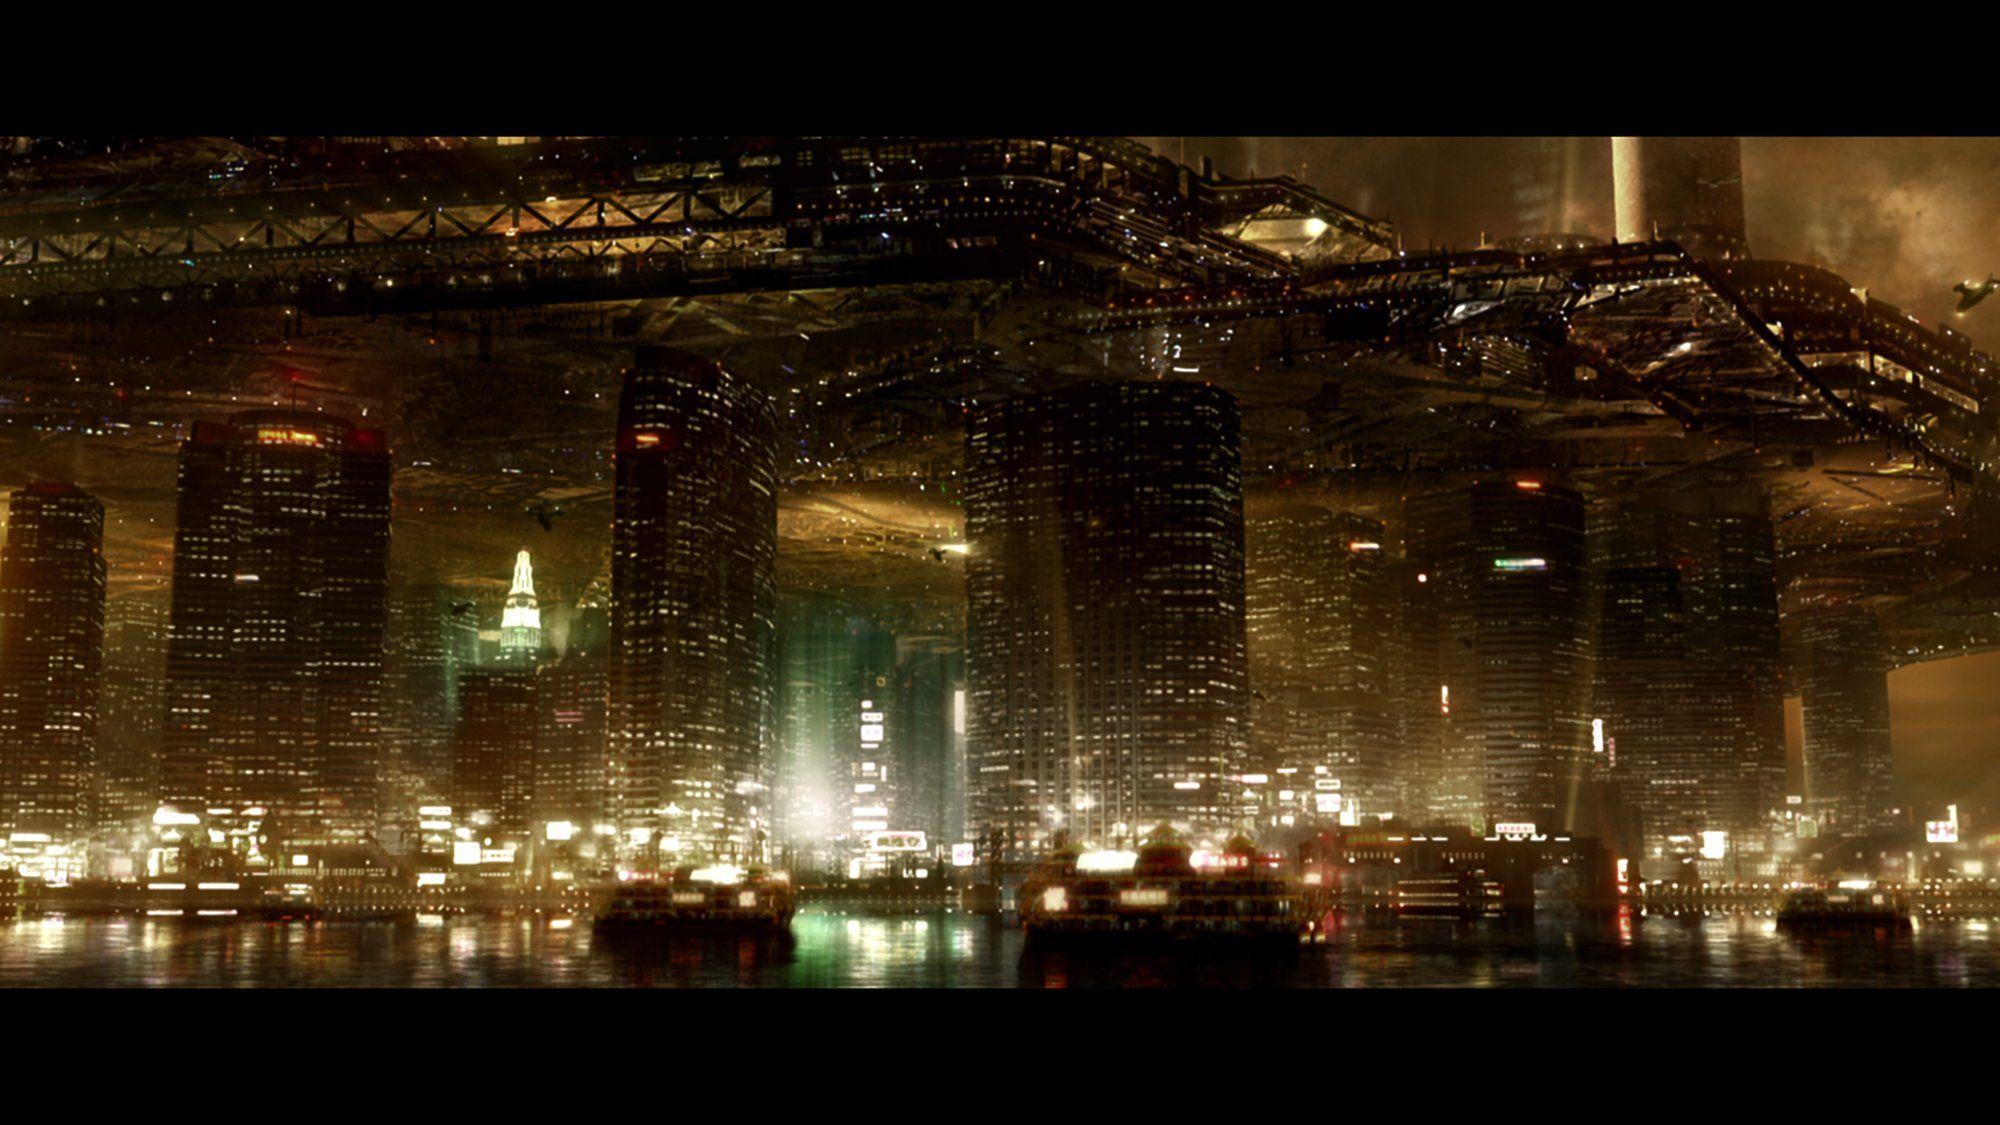 cyberpunk city hd wallpapers - photo #4